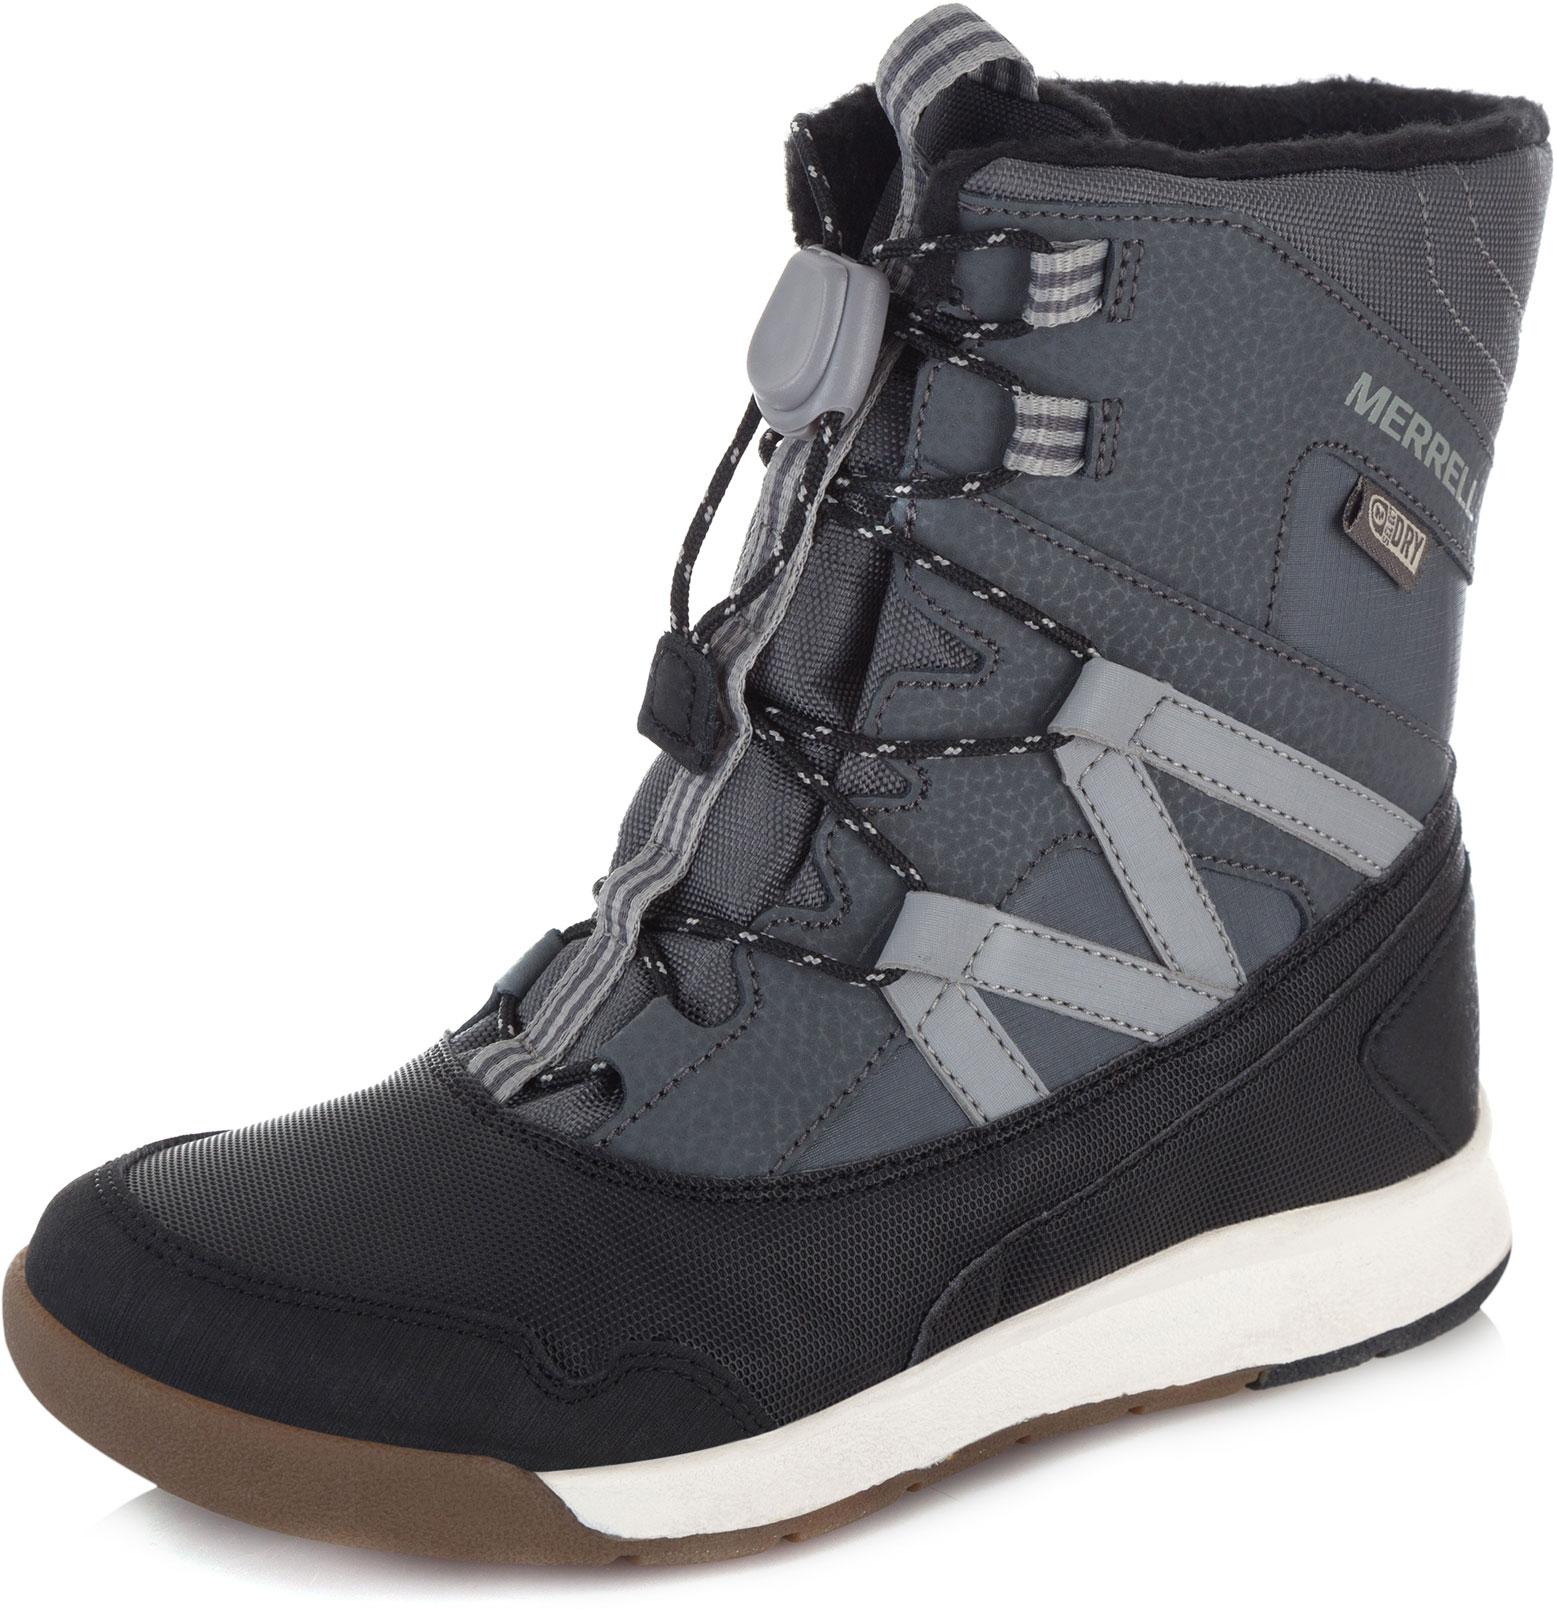 Ботинки Merrell M-Snow Crush Wtrpf ботинки для девочки merrell m moab fst polar mid a c wtrpf цвет черный розовый mk159178 размер 13 30